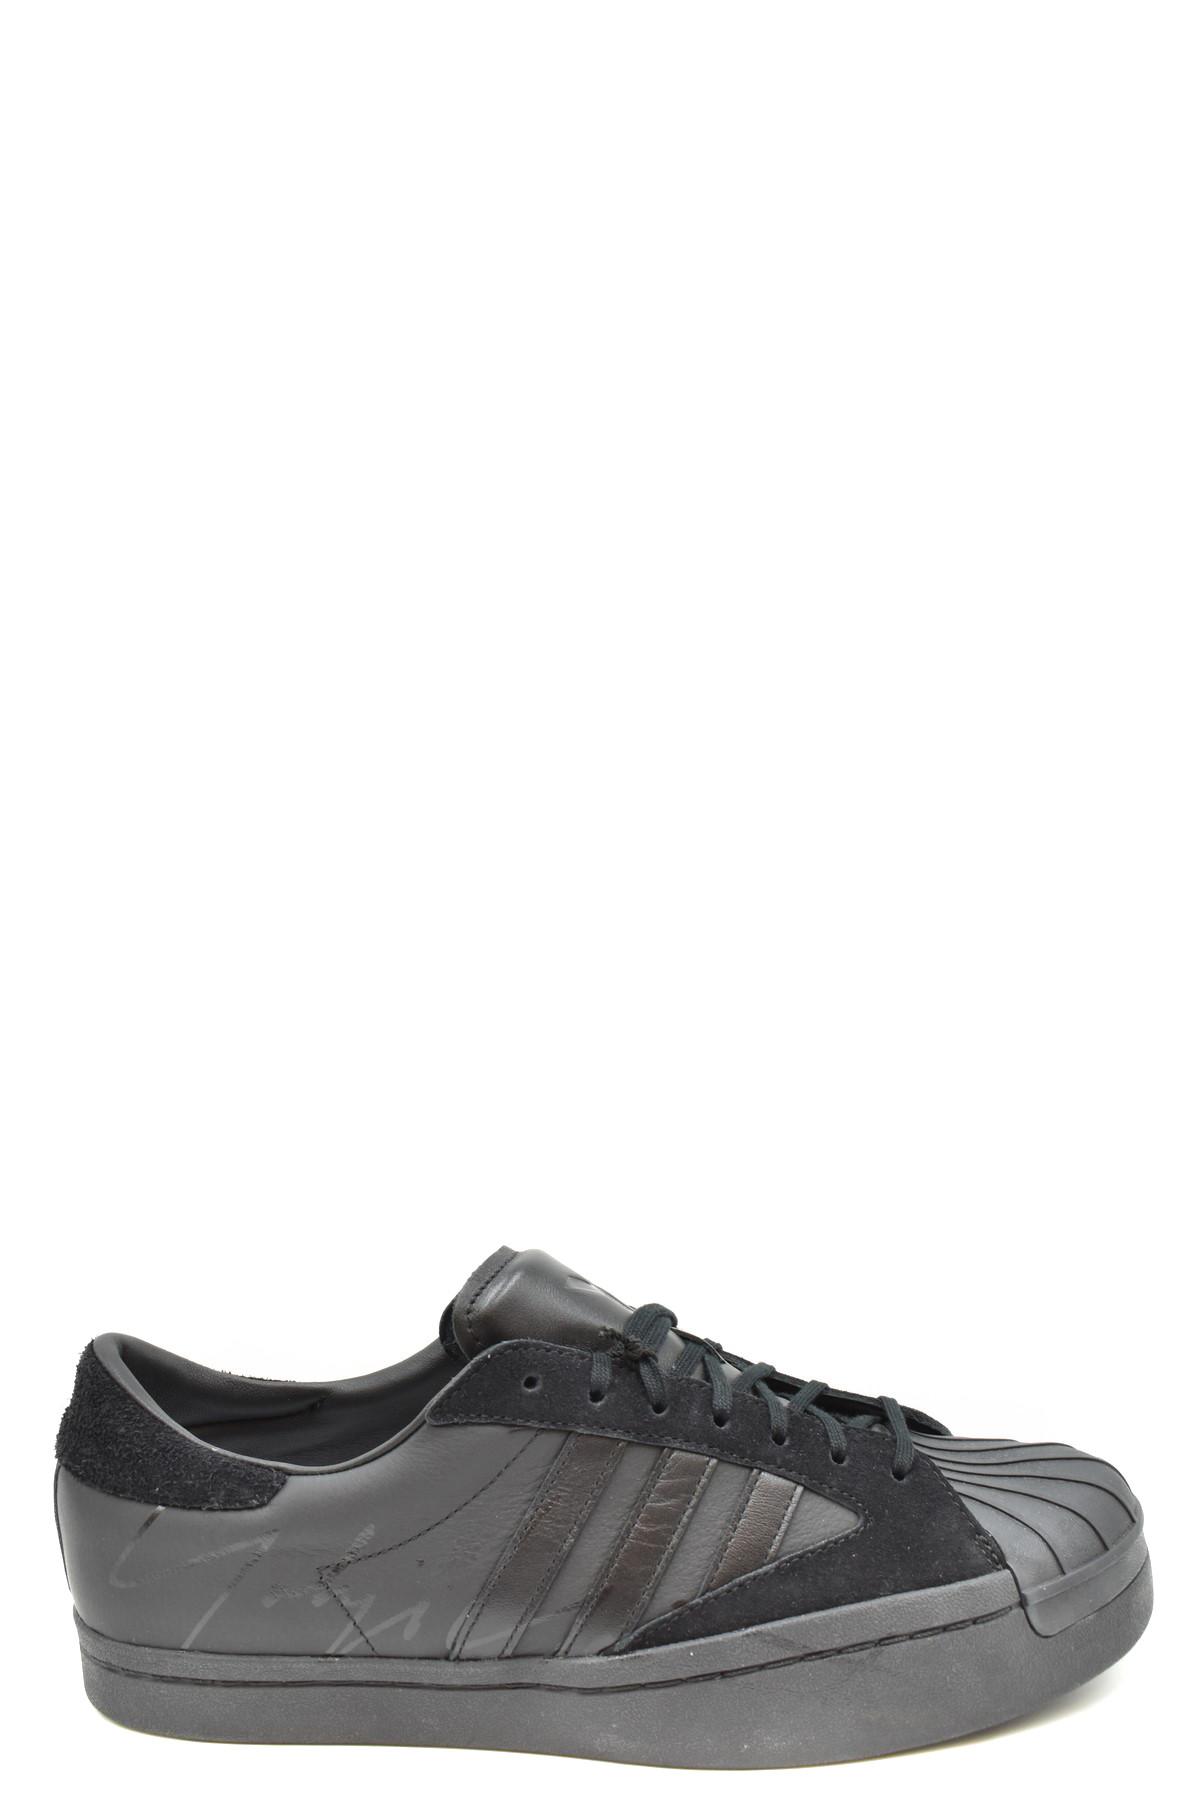 Marchio Adidas Y-3 Yohji Yamamoto Genere Uomo Tipologia Sneakers Stagione A…